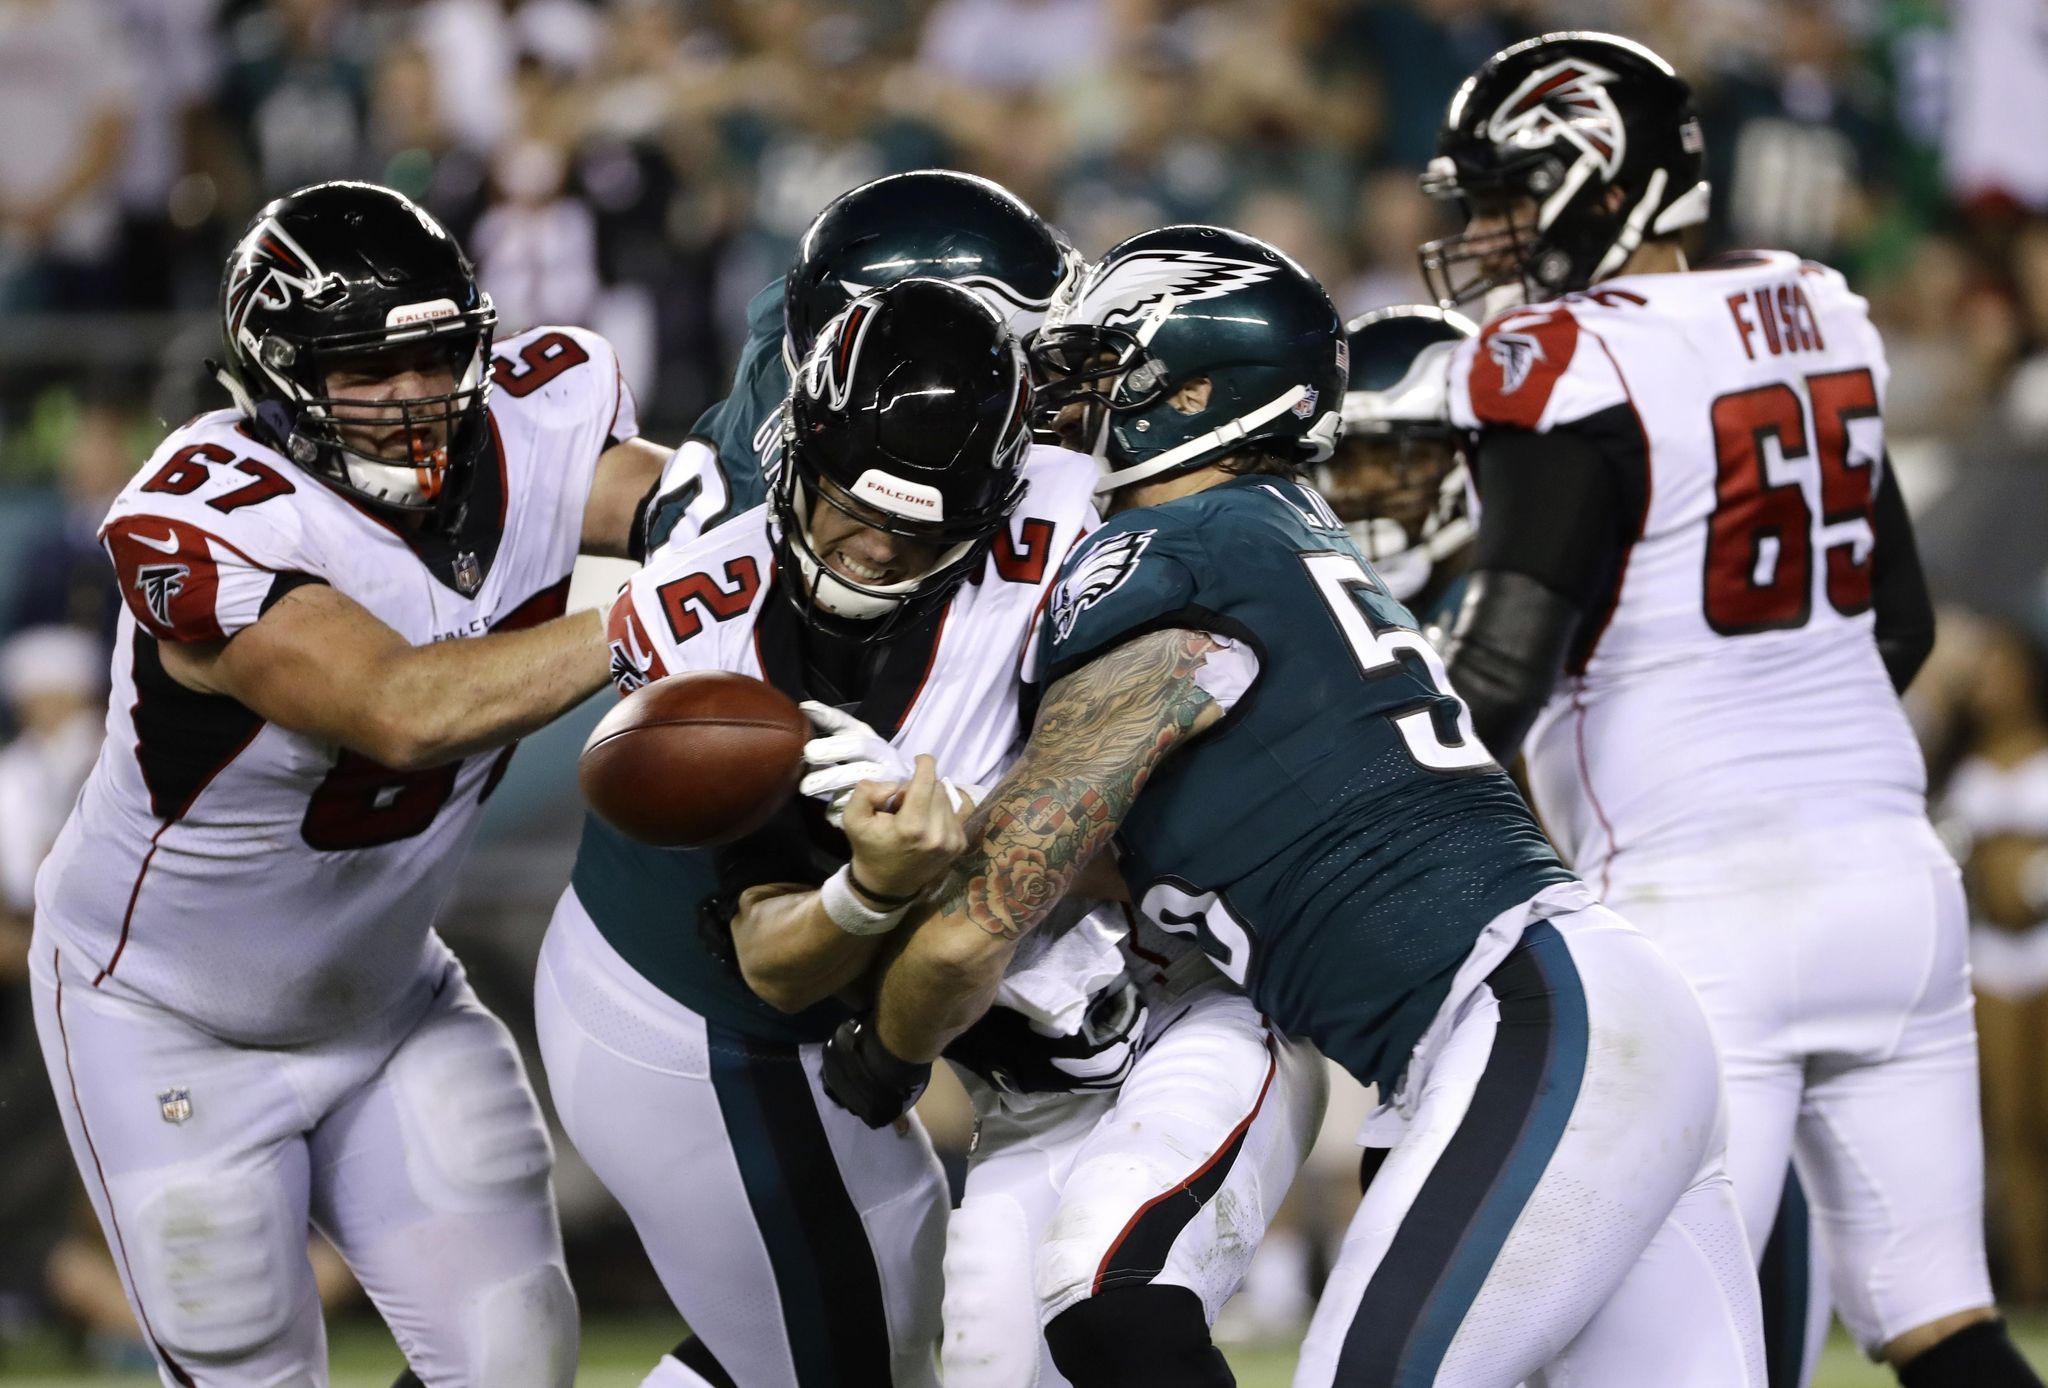 Falcons_eagles_football_27915_s2048x1388